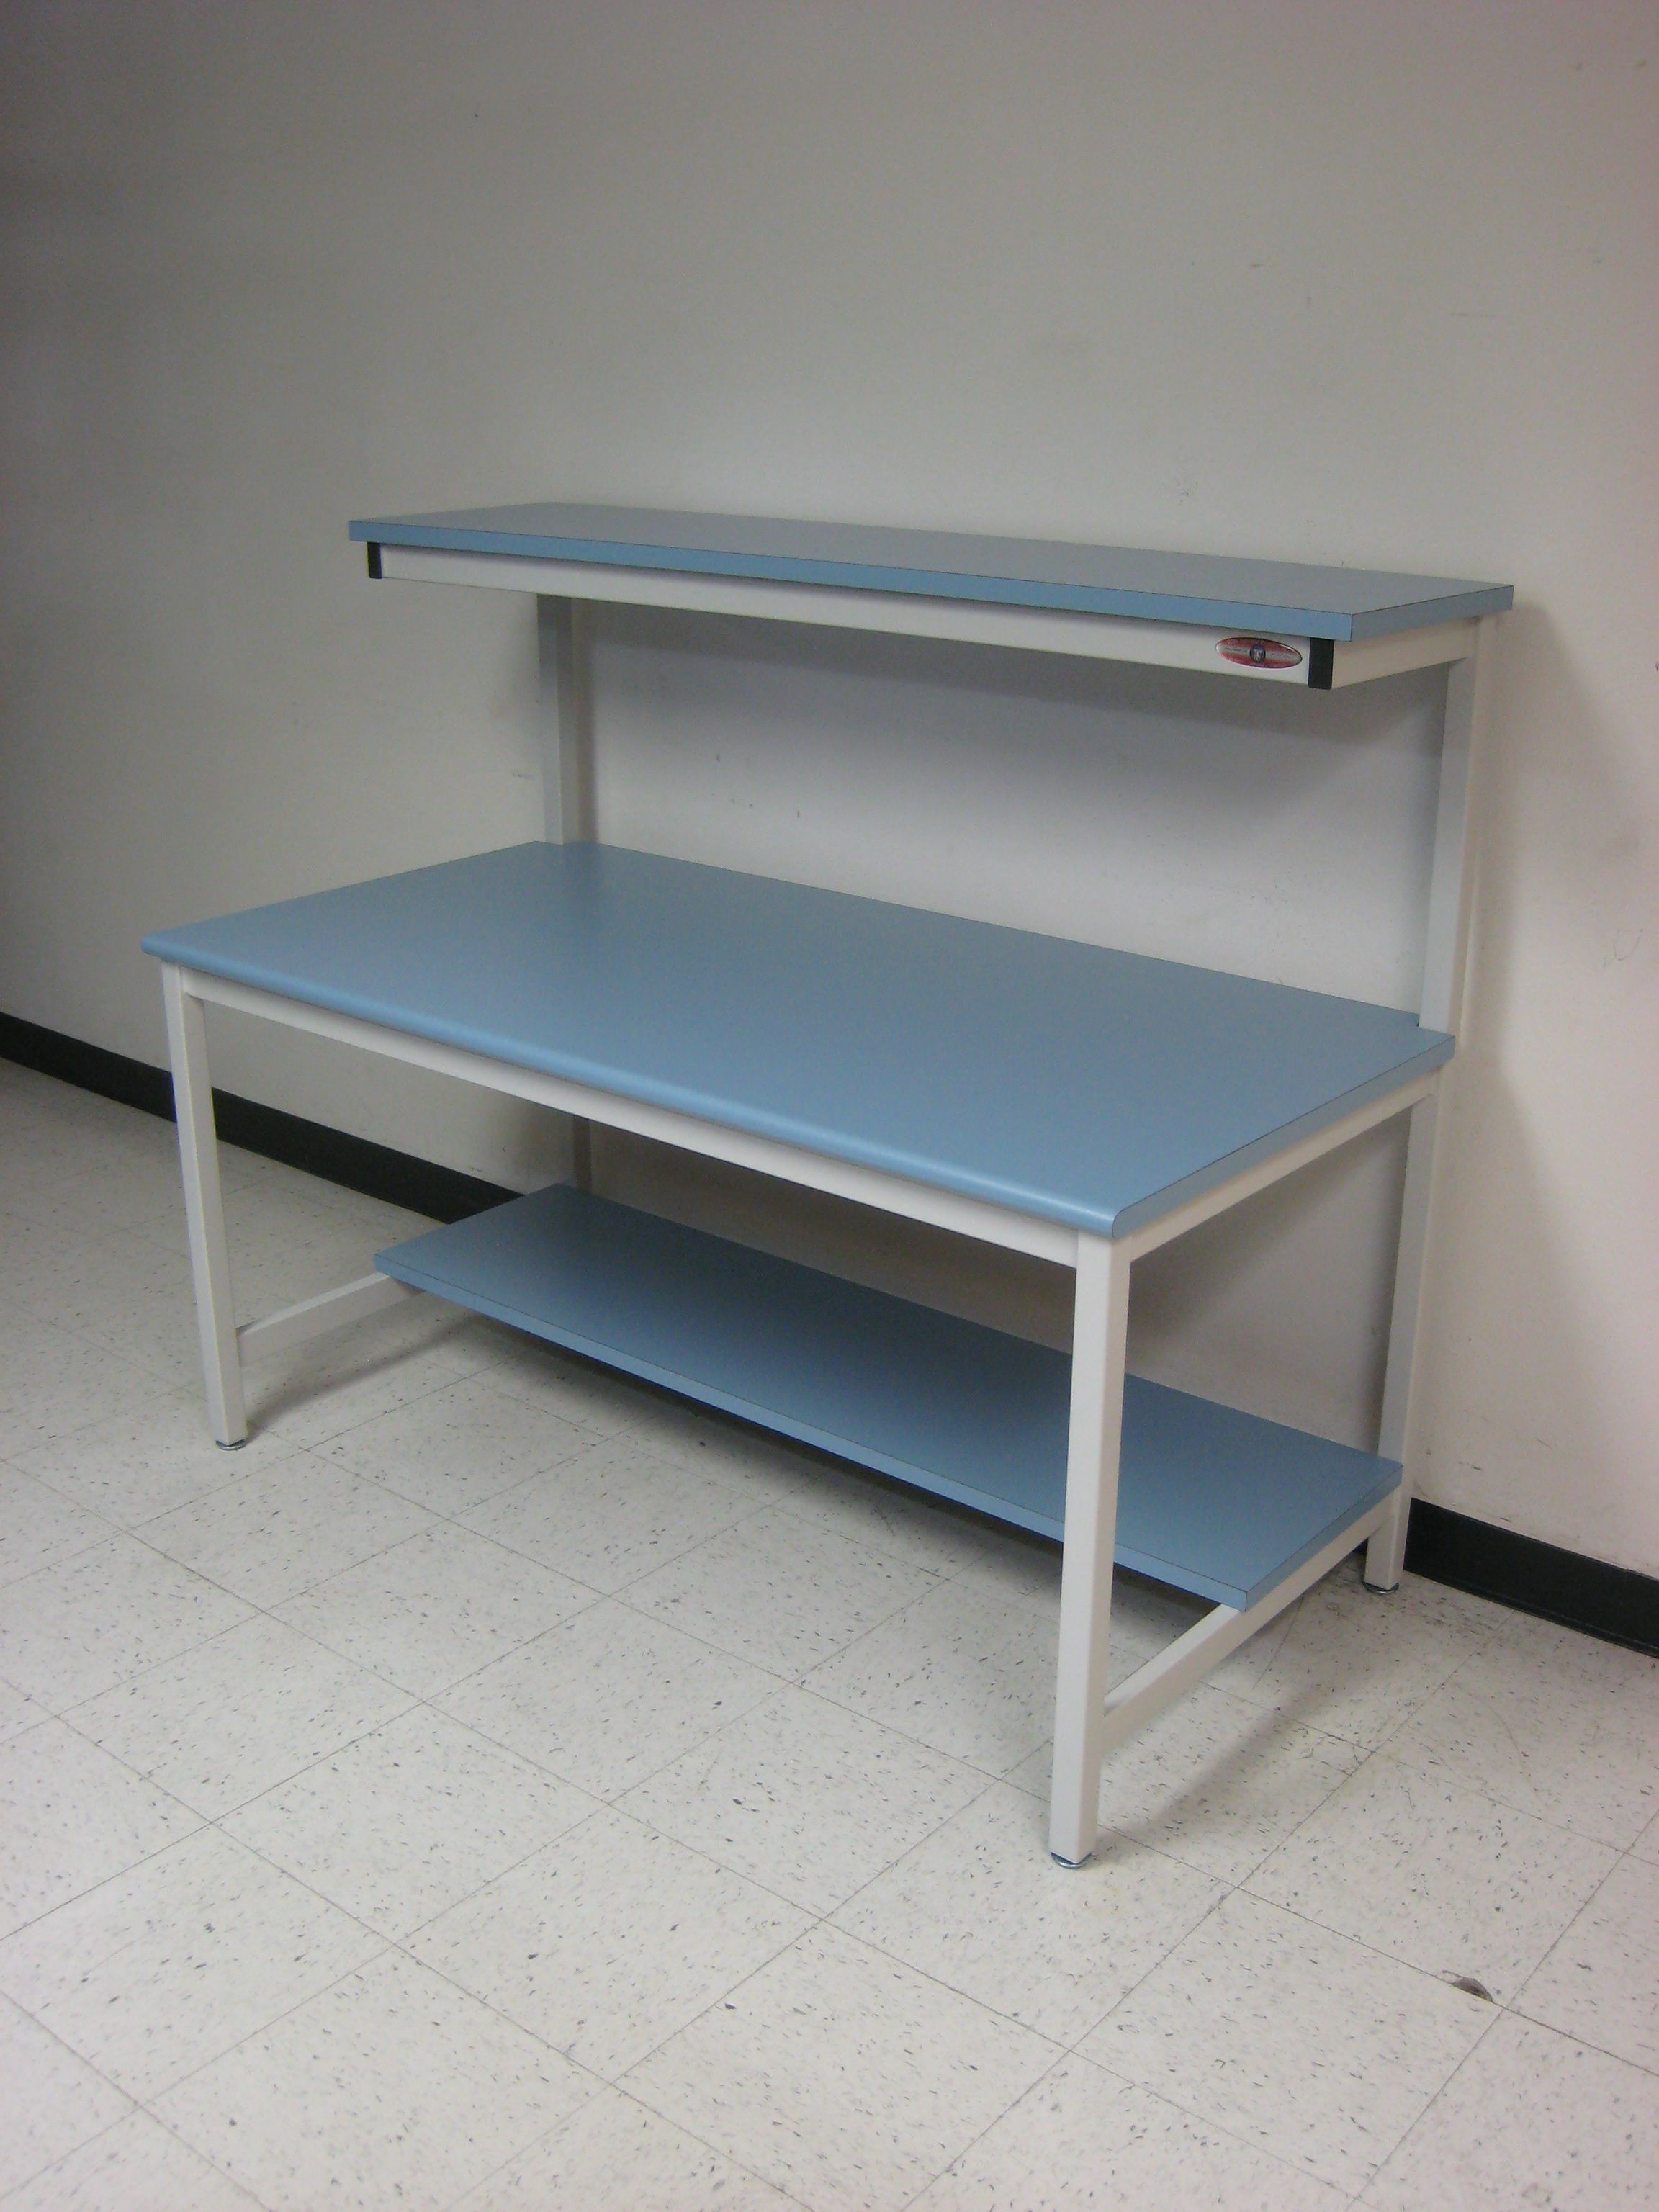 Marvelous Rdm Standard Style Tech Workbench With Cantilevered Upper Machost Co Dining Chair Design Ideas Machostcouk